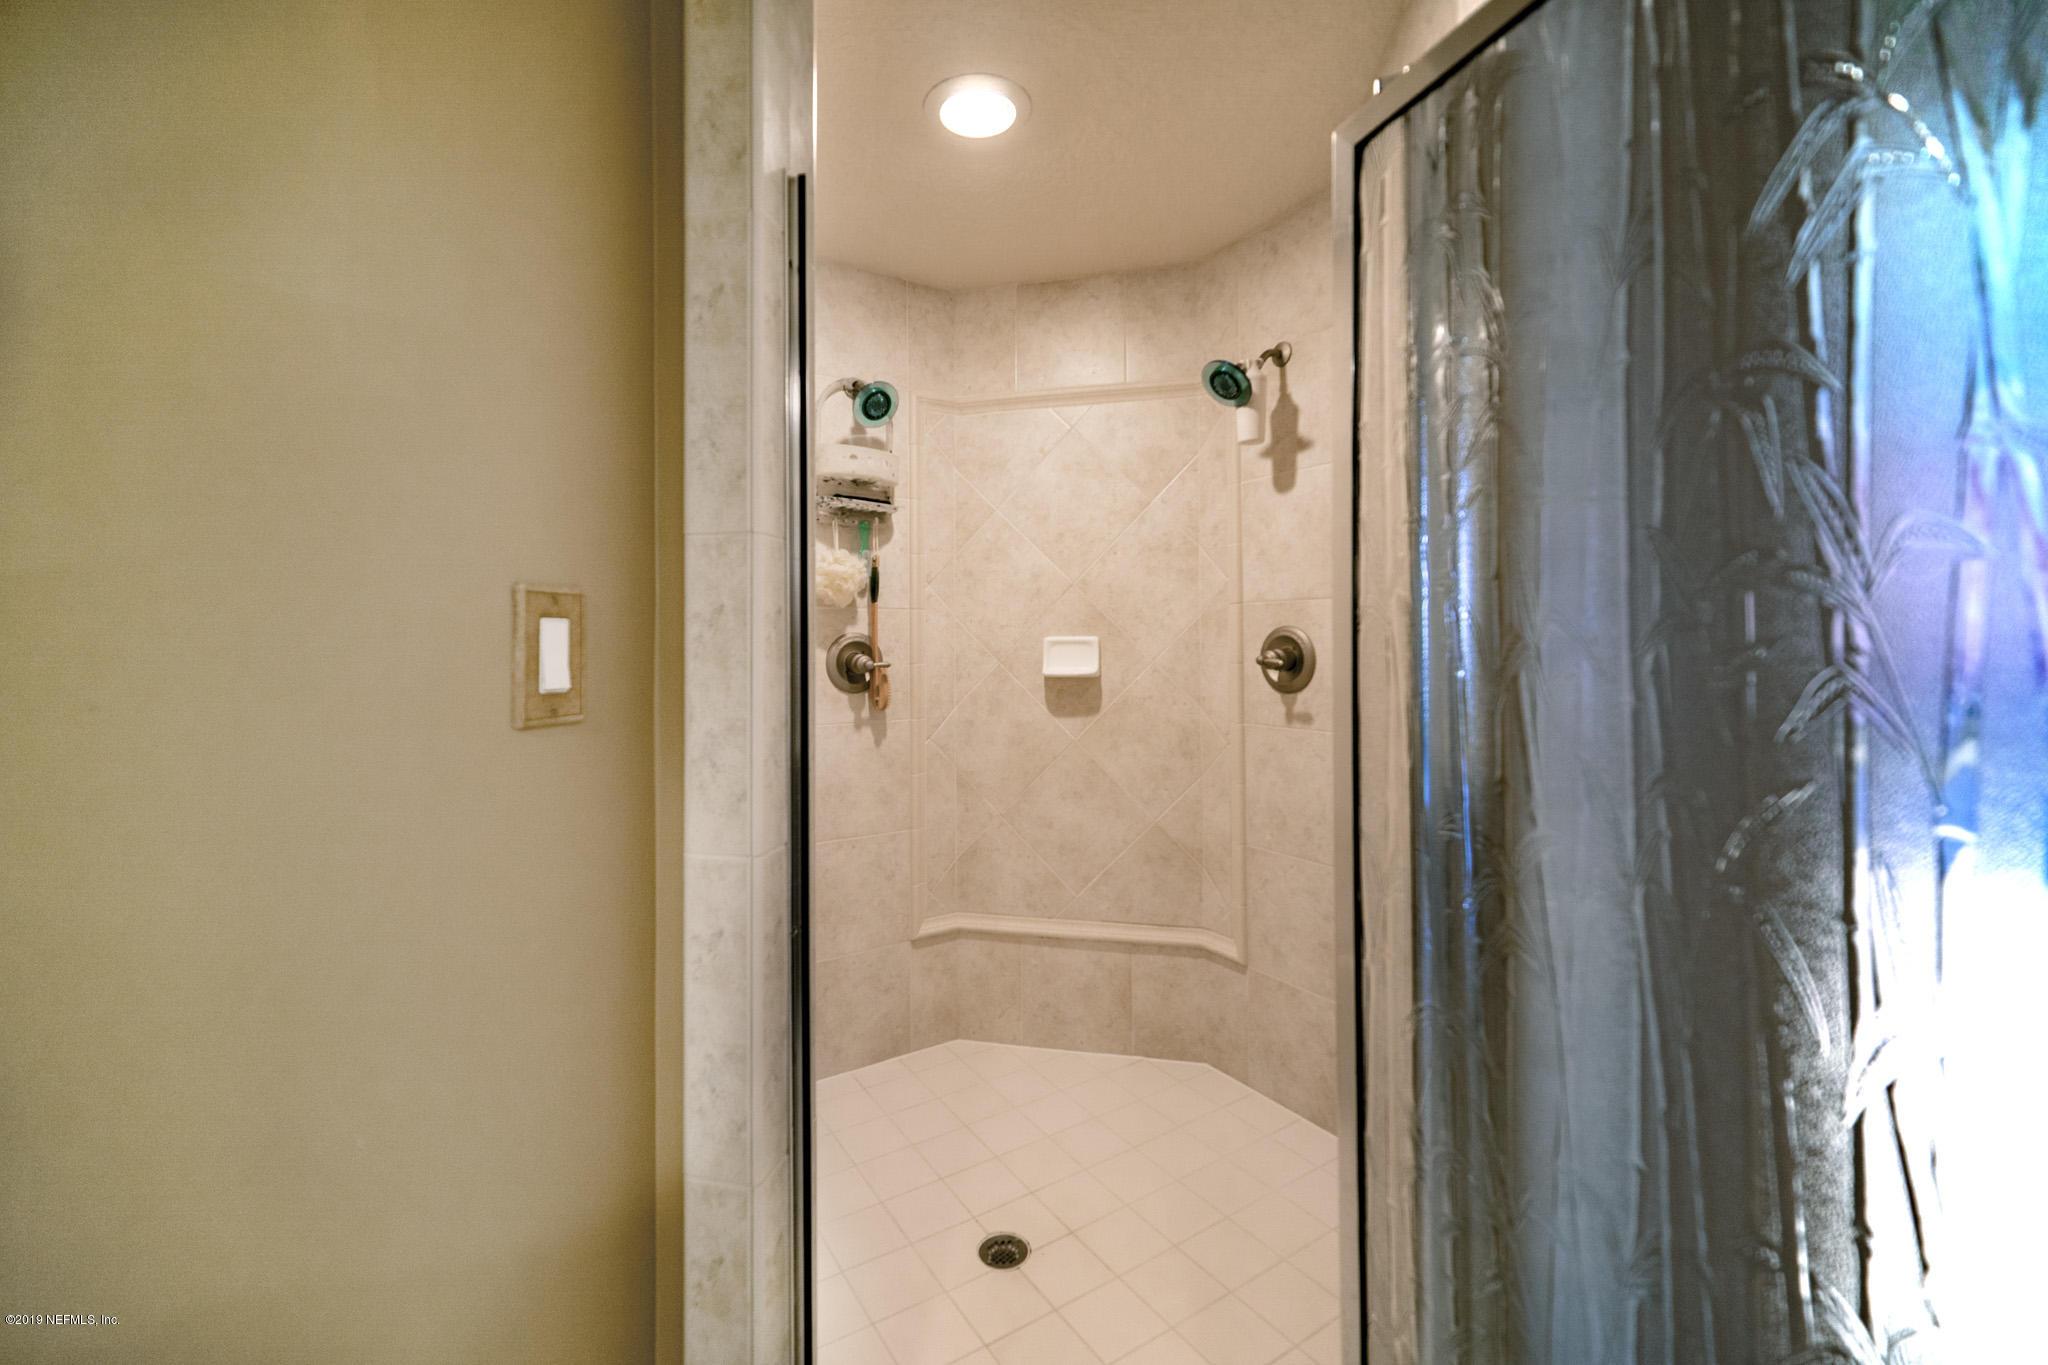 130 SERENATA, PONTE VEDRA BEACH, FLORIDA 32082, 4 Bedrooms Bedrooms, ,3 BathroomsBathrooms,Condo,For sale,SERENATA,983729